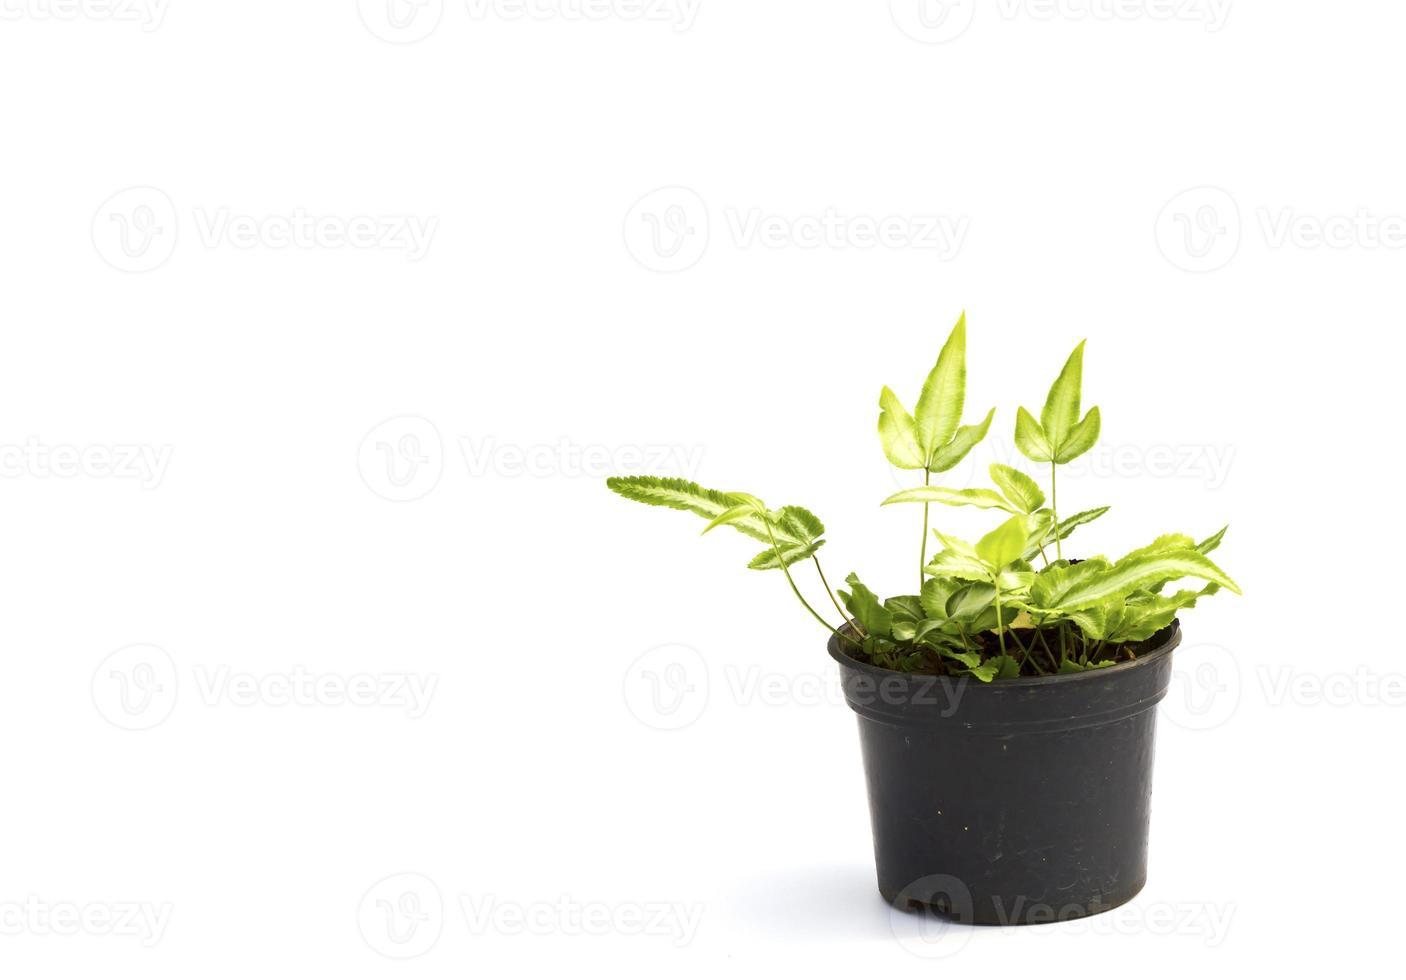 pequeña planta en una maceta negra foto